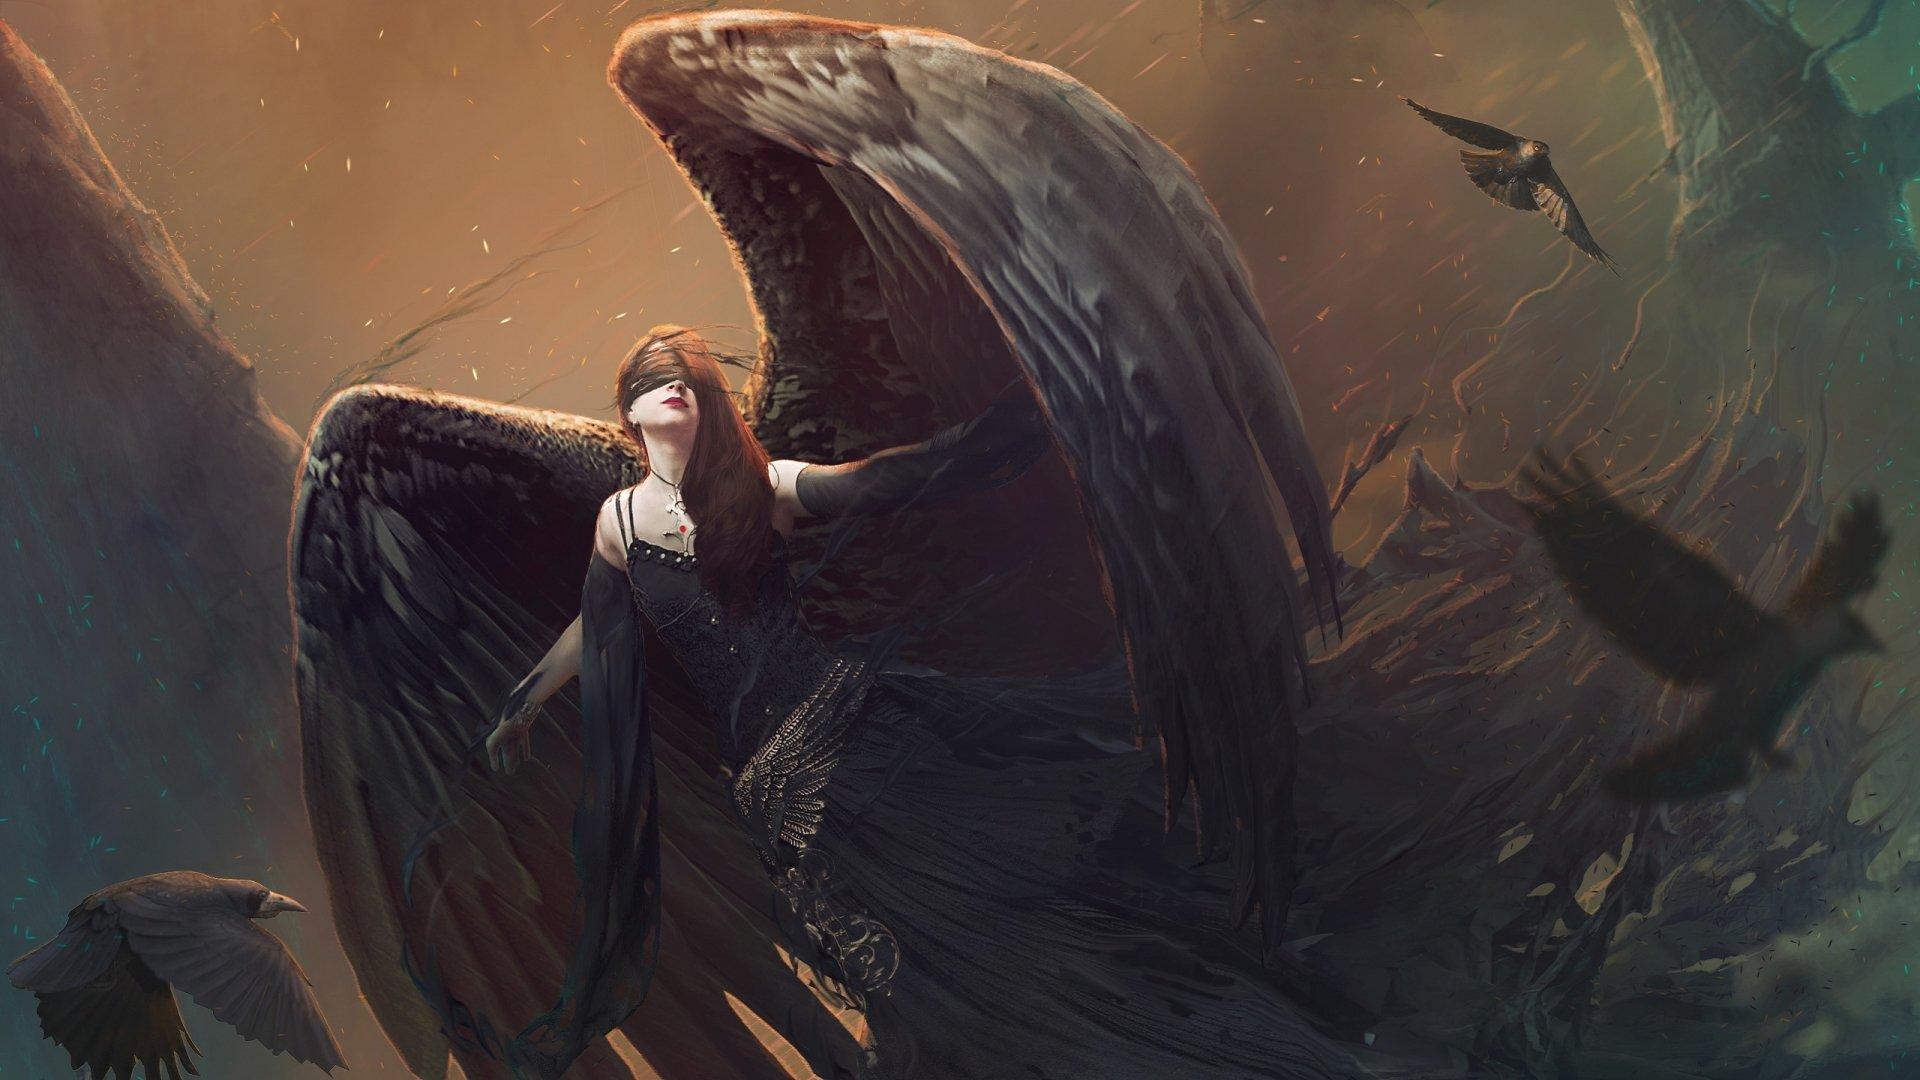 Fantasy - Angel  Bird Woman Fantasy Landscape Dress Black Wallpaper